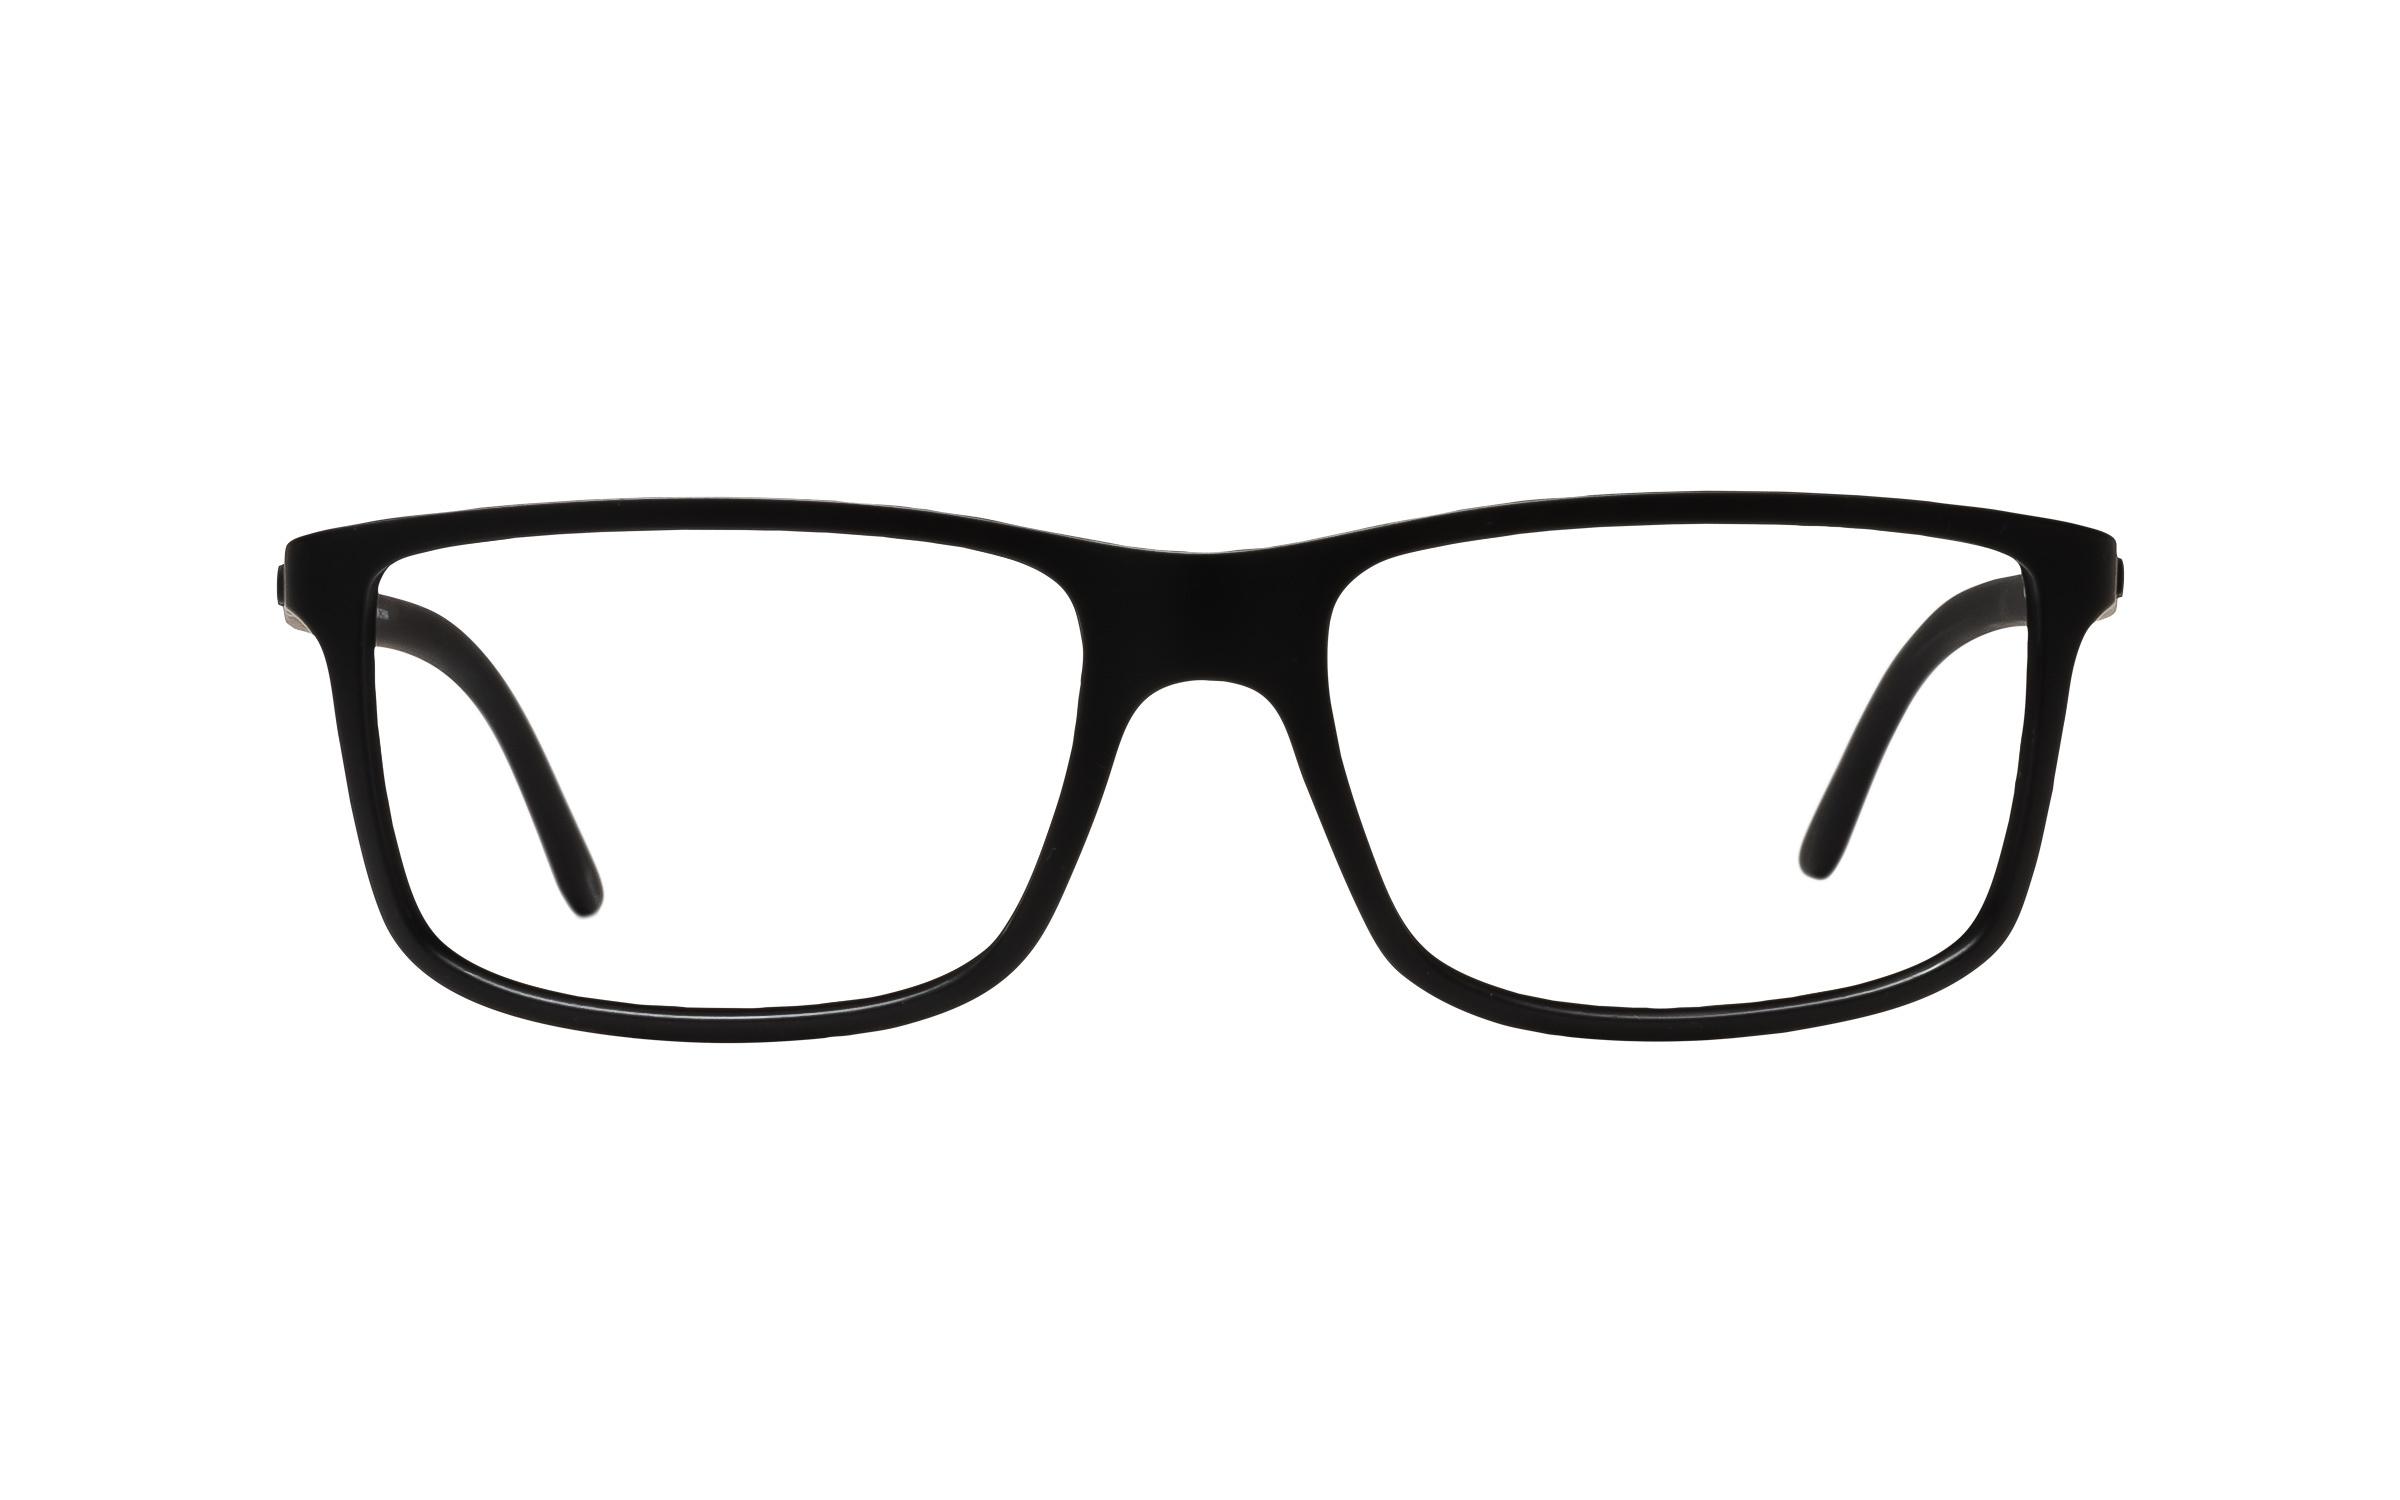 Polo Ralph Lauren PH2126 5505 (55) Eyeglasses and Frame in Matte Black | Acetate - Online Coastal